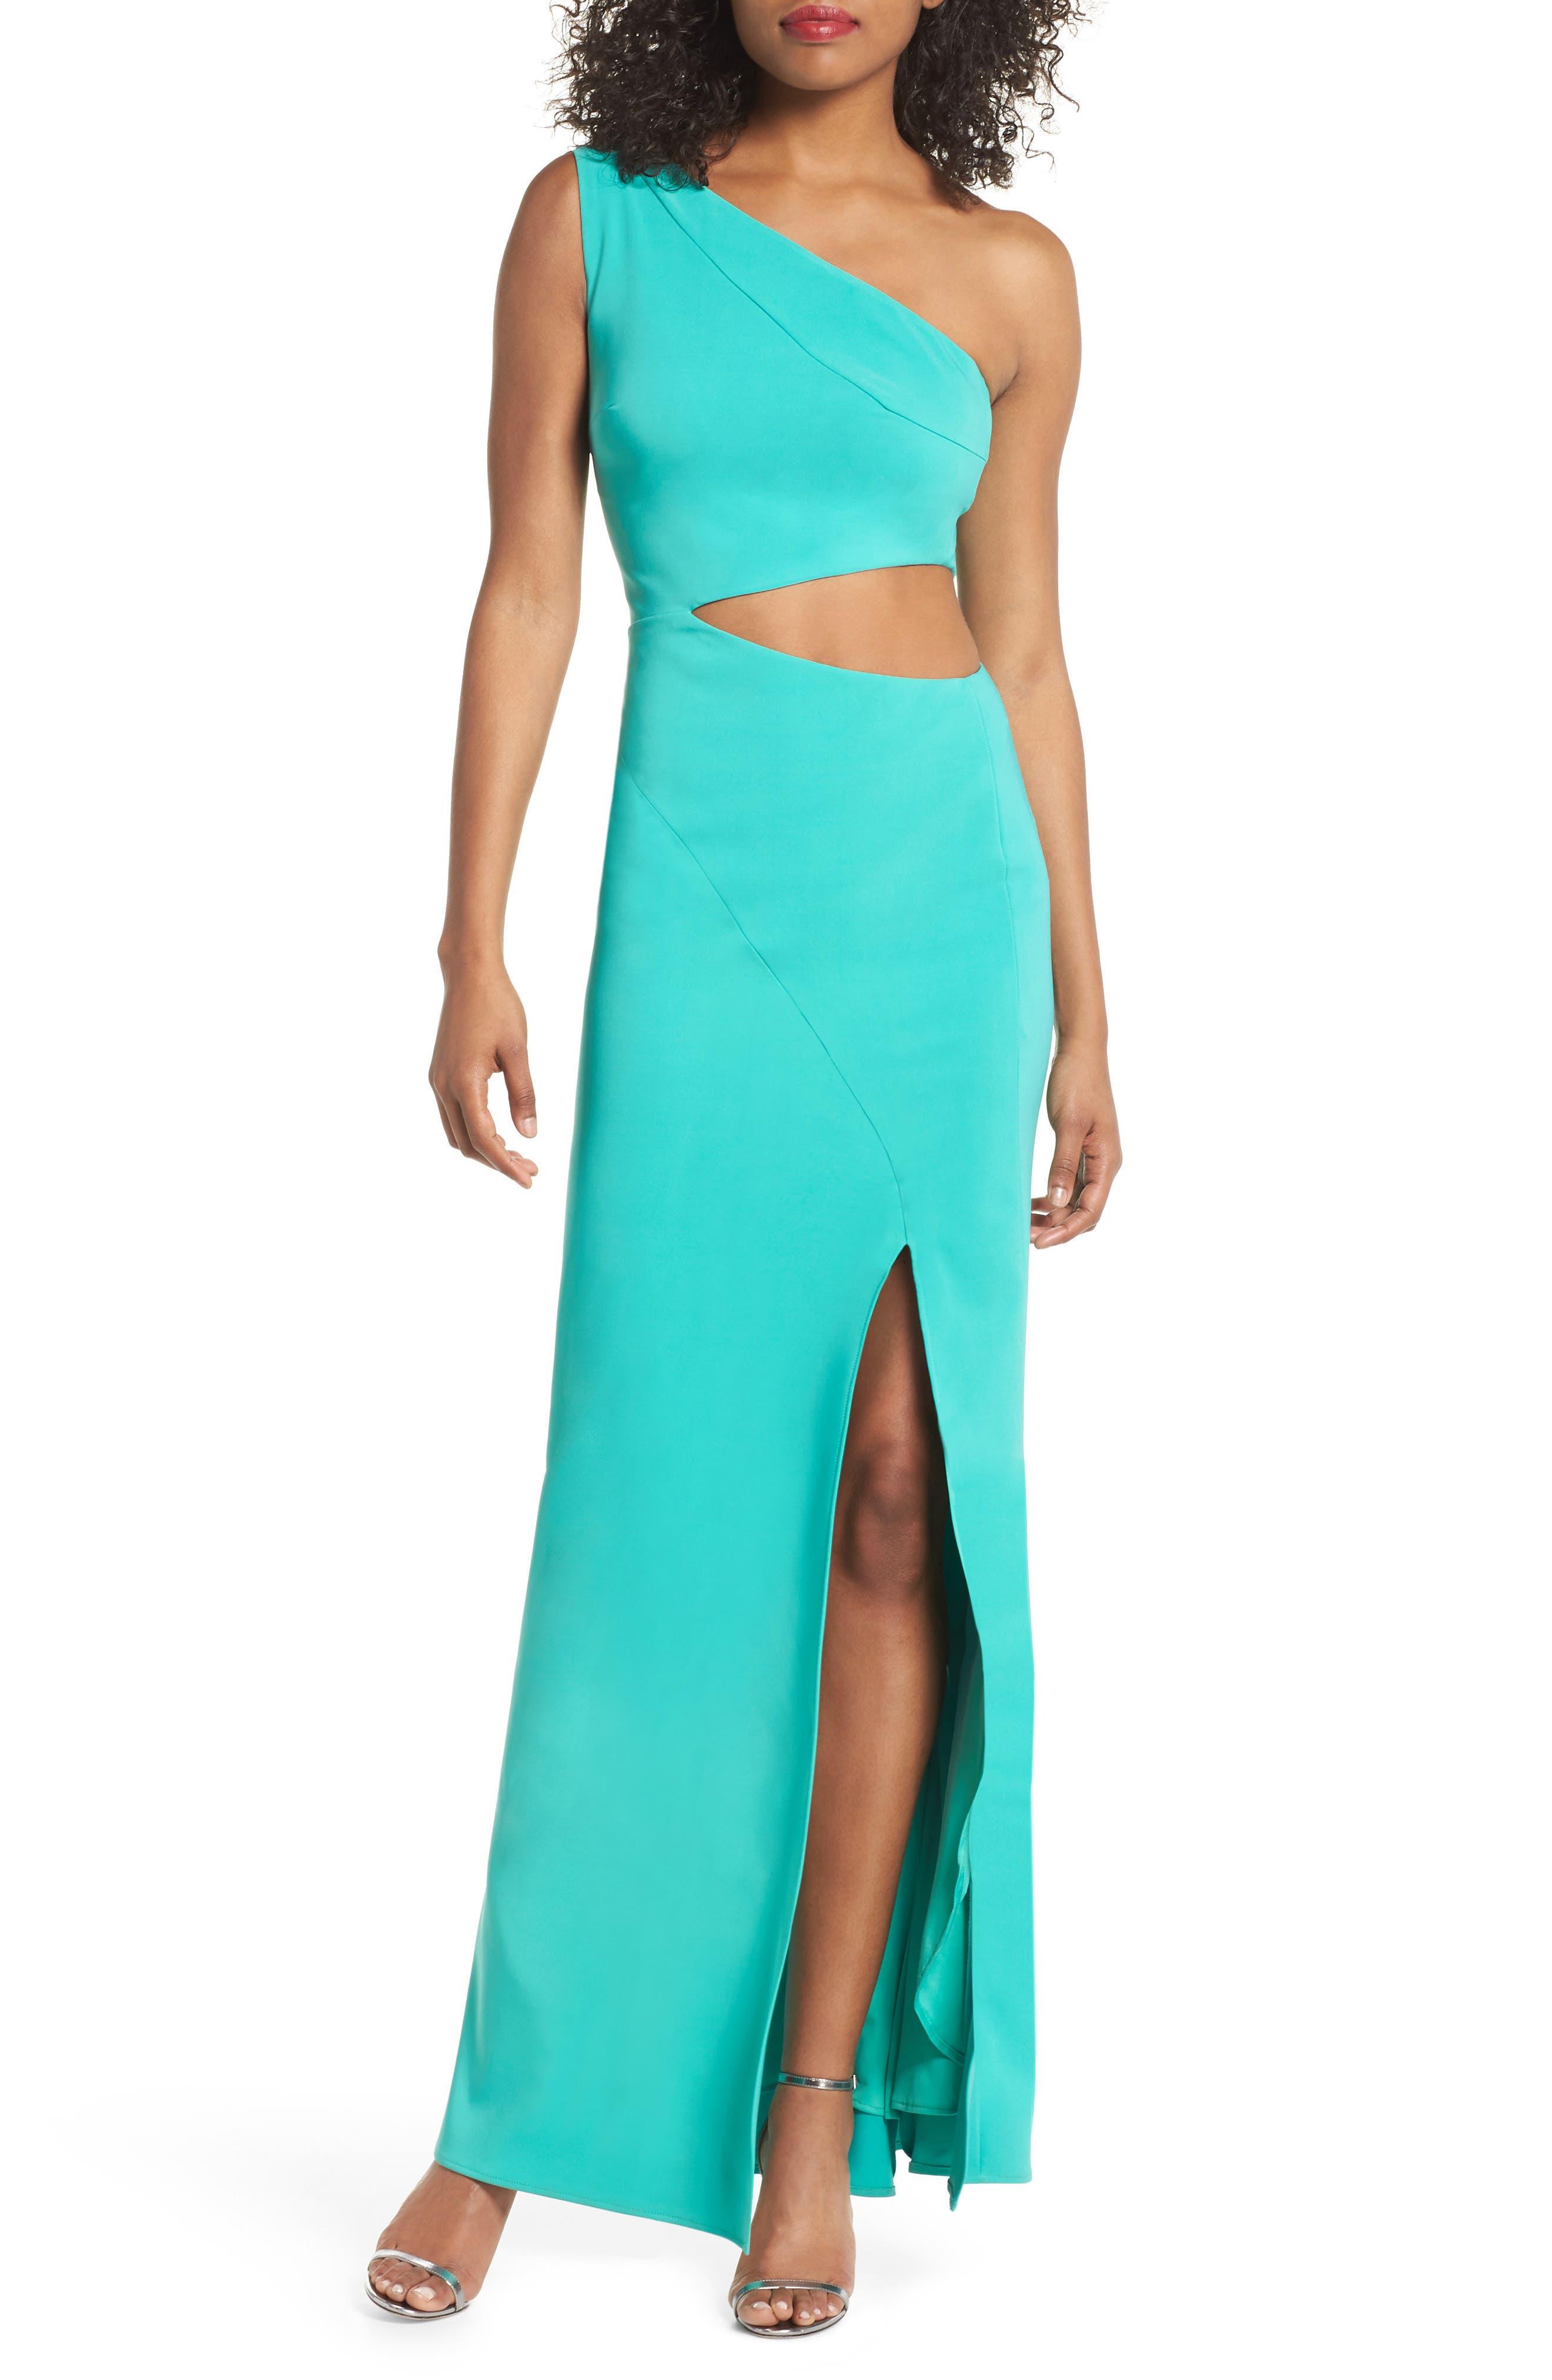 Cameron One-Shoulder Cutout Gown,                         Main,                         color, 384